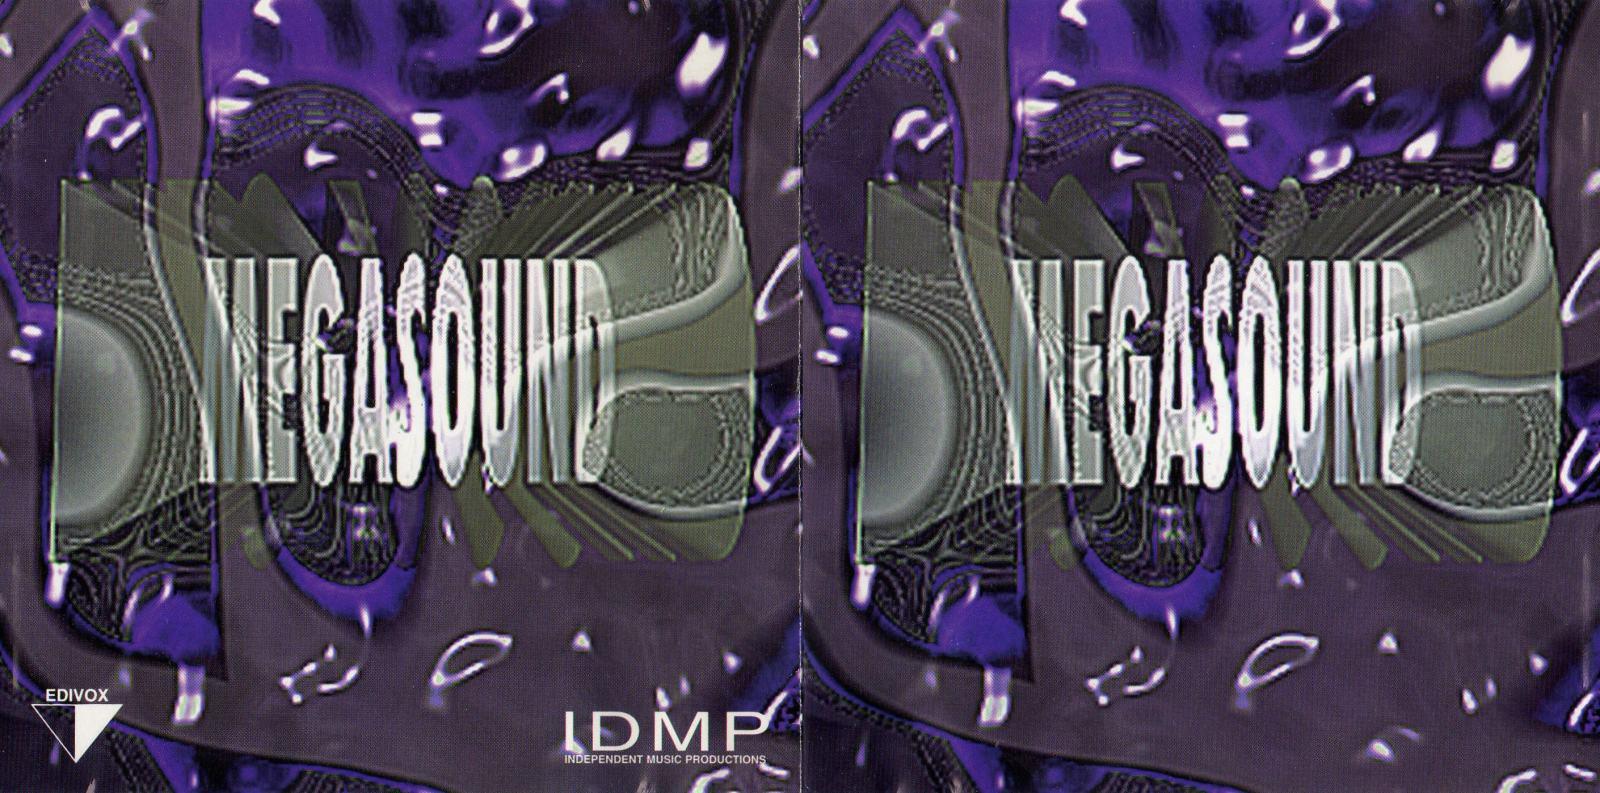 MEGASOUND MIX (1997) EDIVOX 15g5vmq